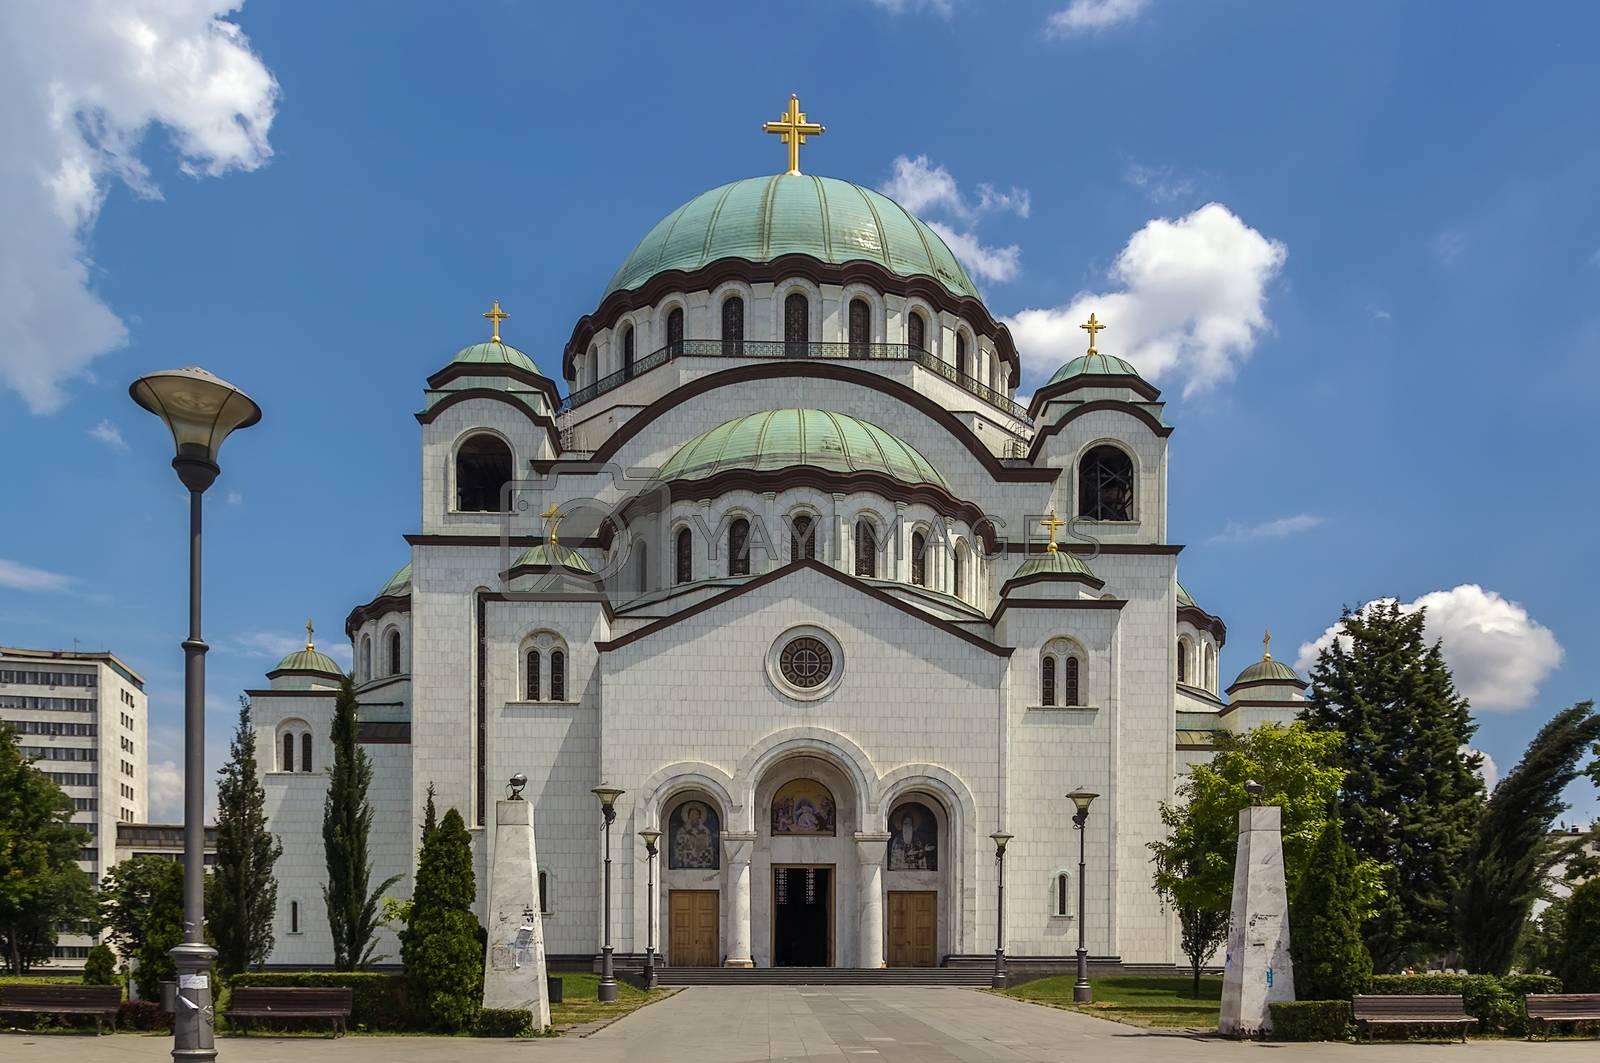 Church of Saint Sava, Belgrade by borisb17